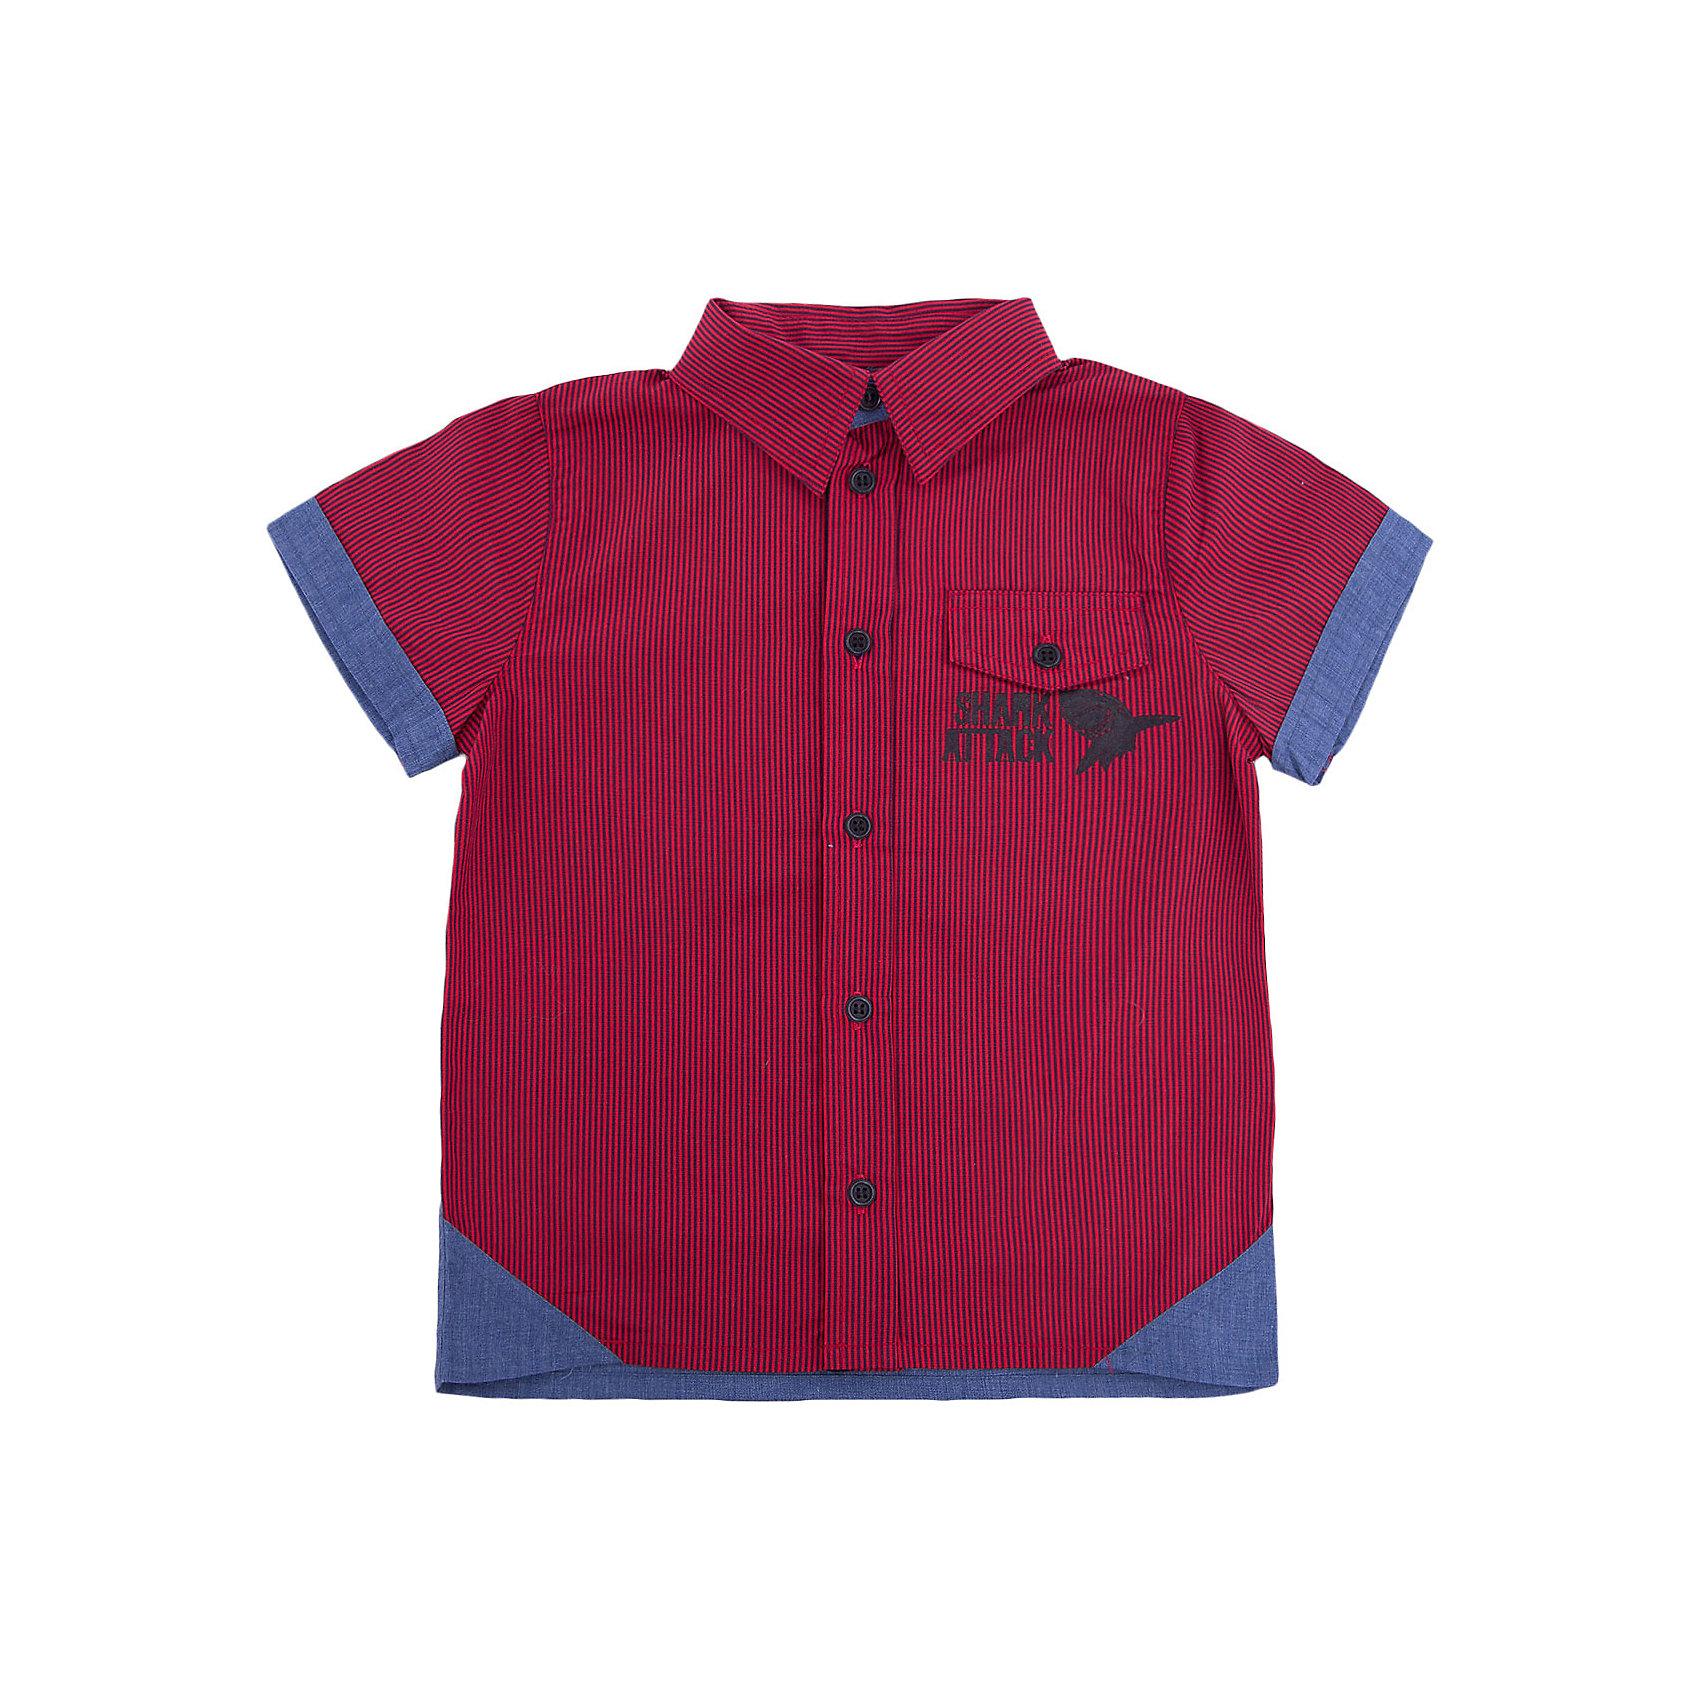 Рубашка для мальчика WojcikБлузки и рубашки<br>Рубашка для мальчика Wojcik<br>Состав:<br>Хлопок 100%<br><br>Ширина мм: 174<br>Глубина мм: 10<br>Высота мм: 169<br>Вес г: 157<br>Цвет: красный<br>Возраст от месяцев: 120<br>Возраст до месяцев: 132<br>Пол: Мужской<br>Возраст: Детский<br>Размер: 146,104,110,116,122,128,134,140<br>SKU: 5588811